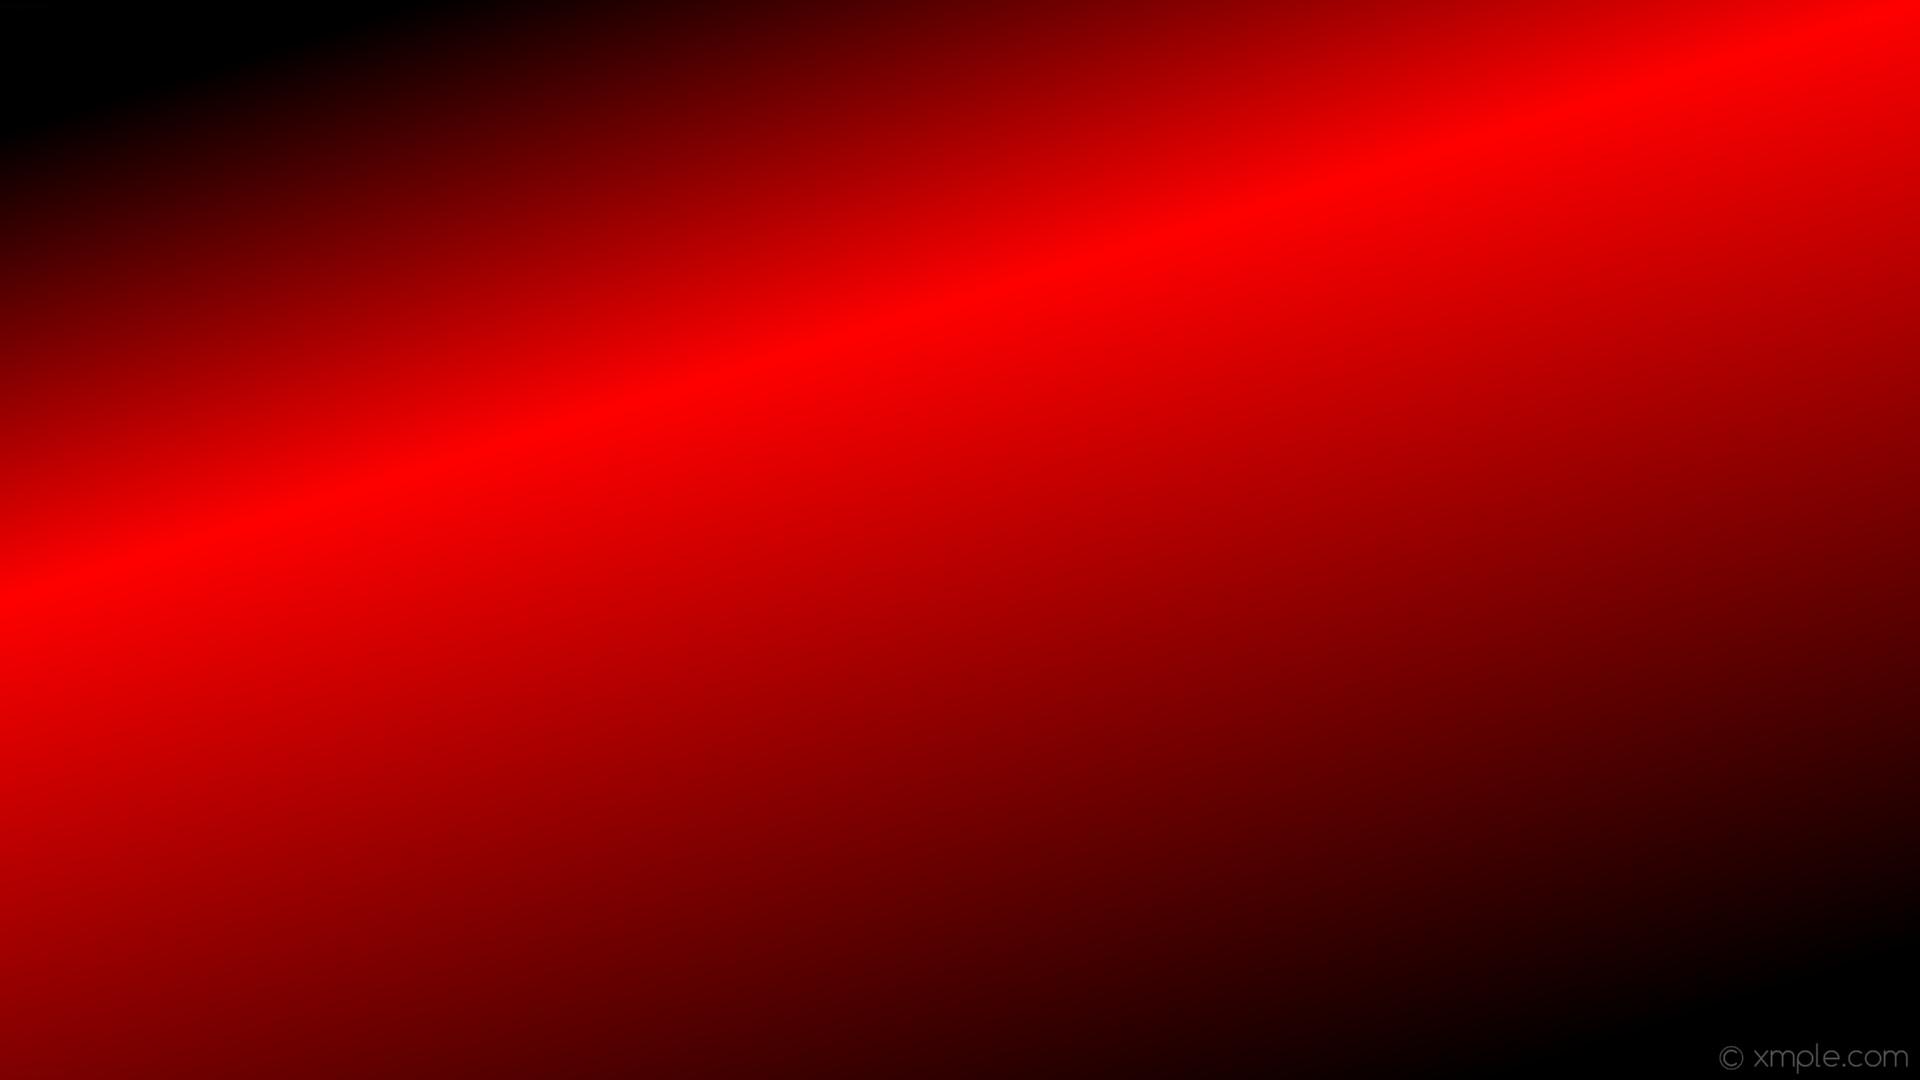 wallpaper linear red black gradient highlight #000000 #ff0000 315° 67%